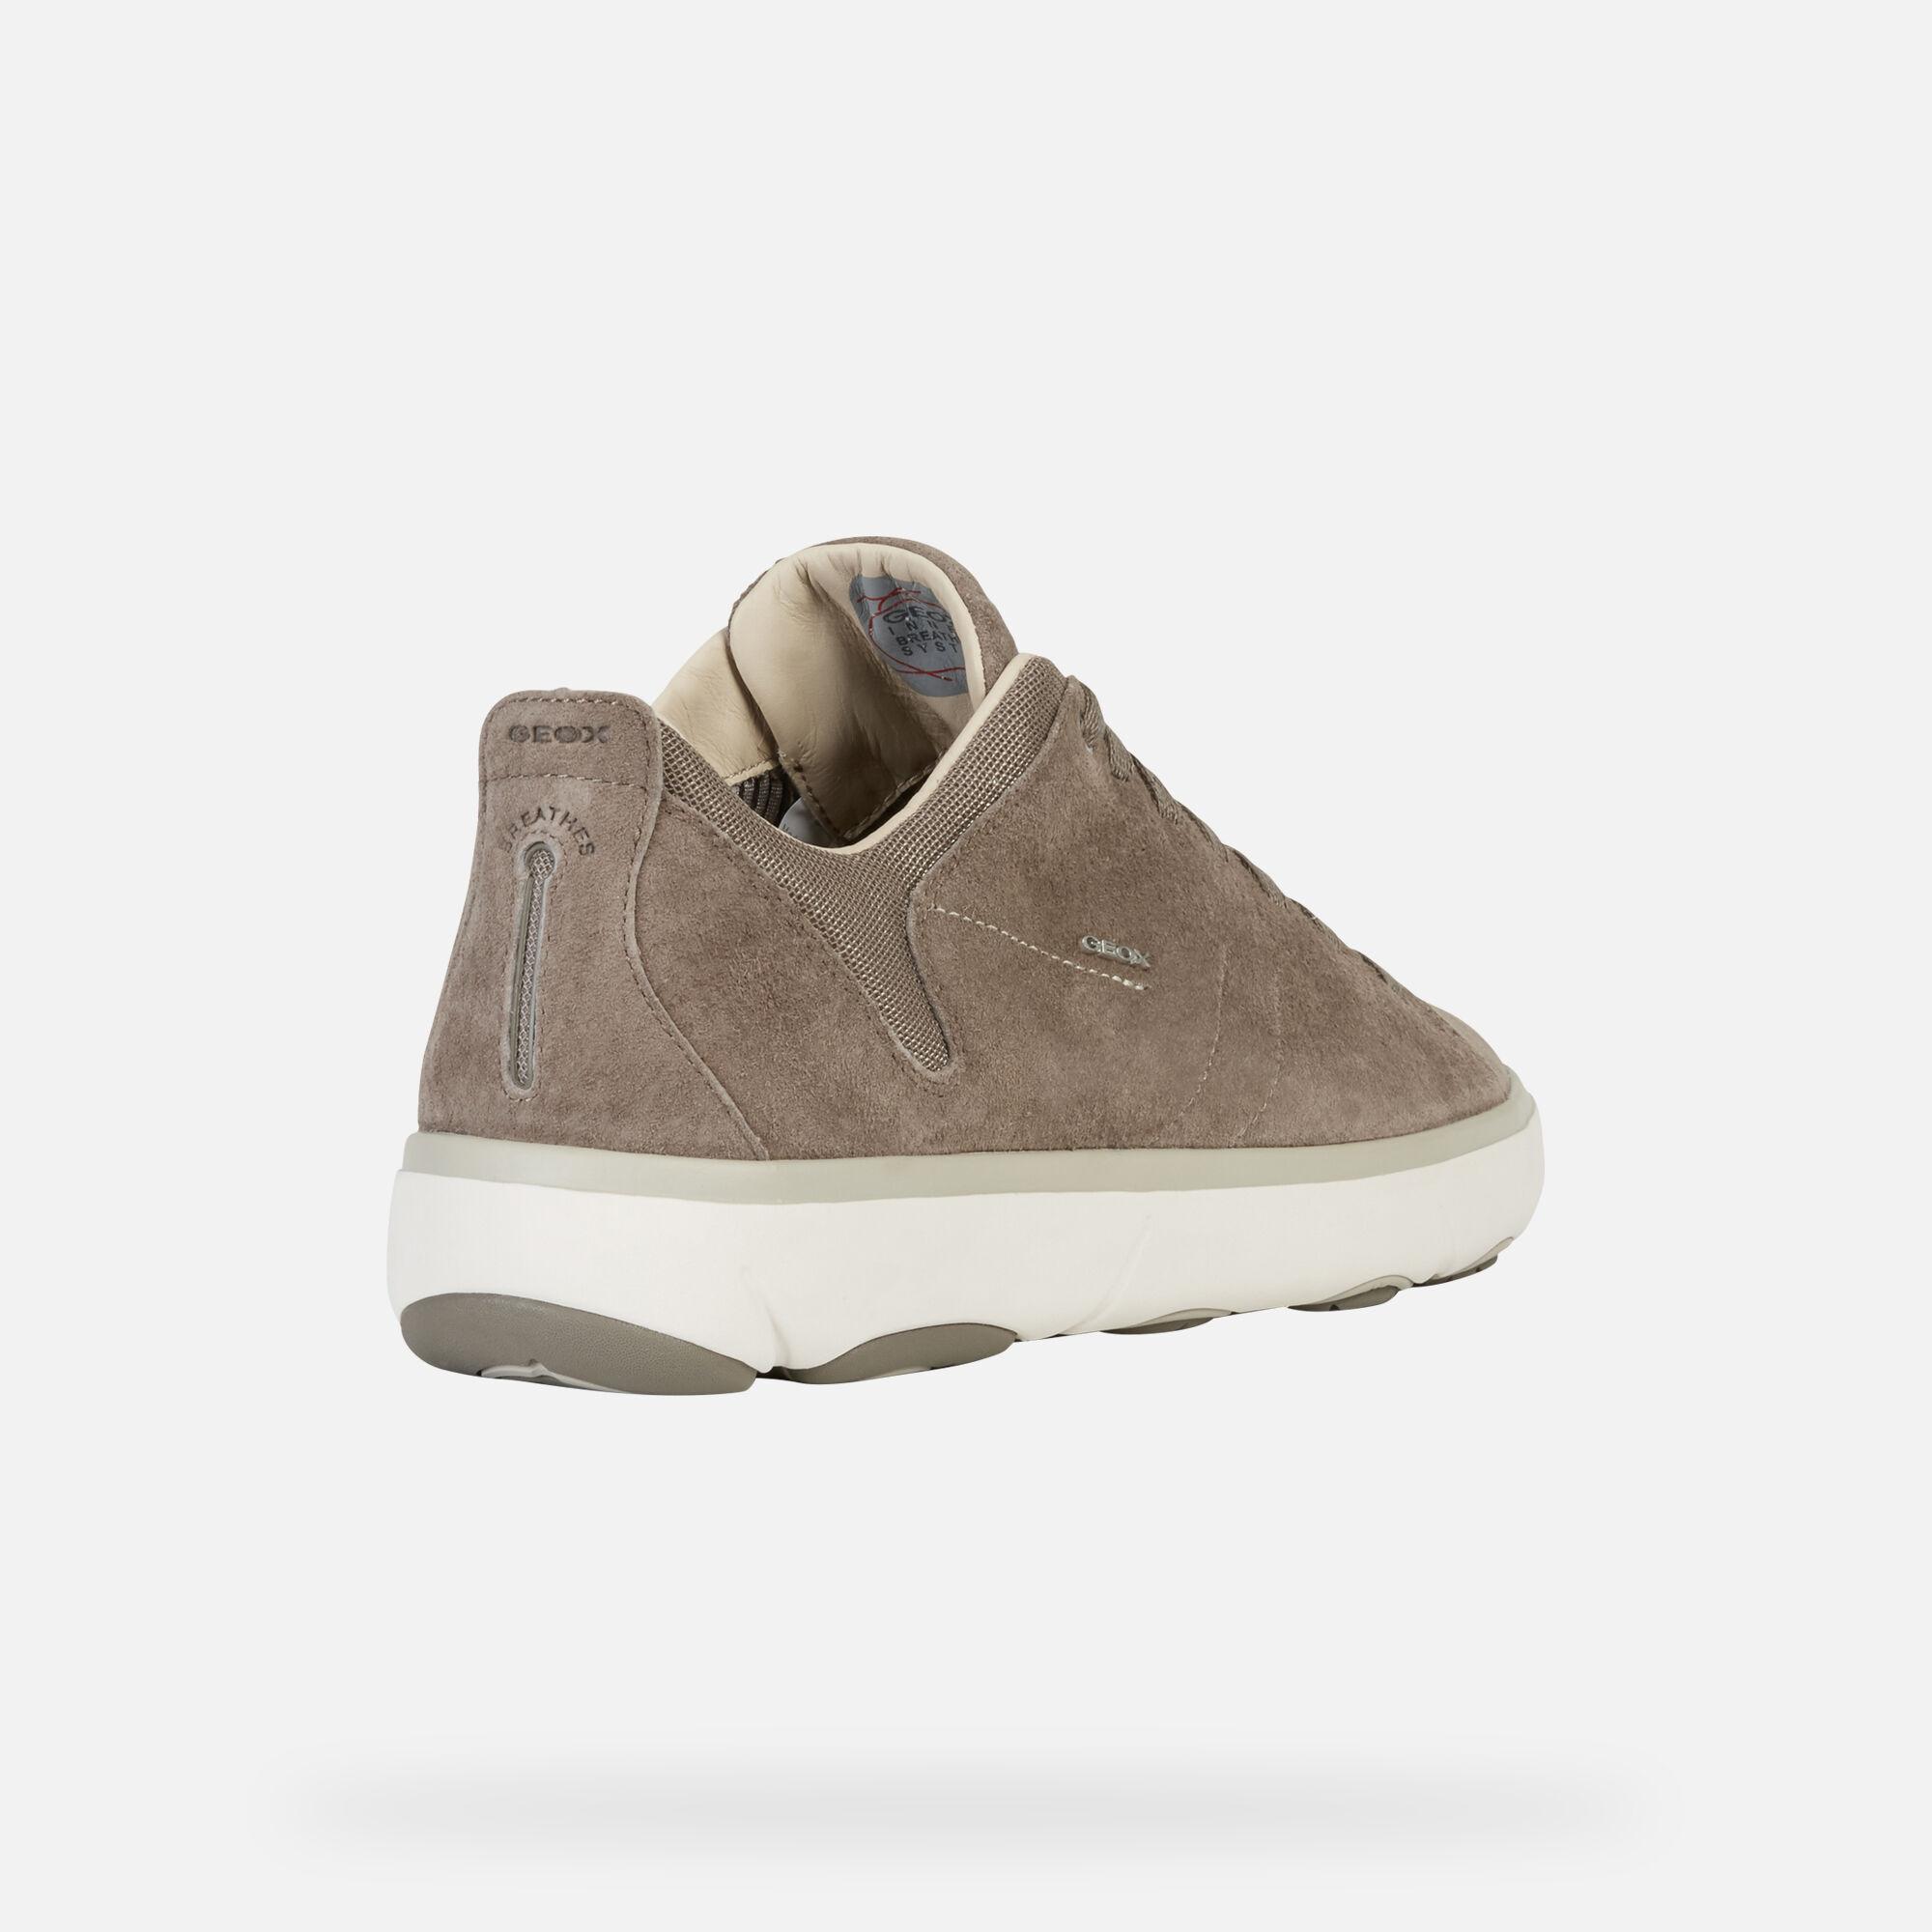 geox shoes USA warehouse sale, Men Trainers Geox BOX High